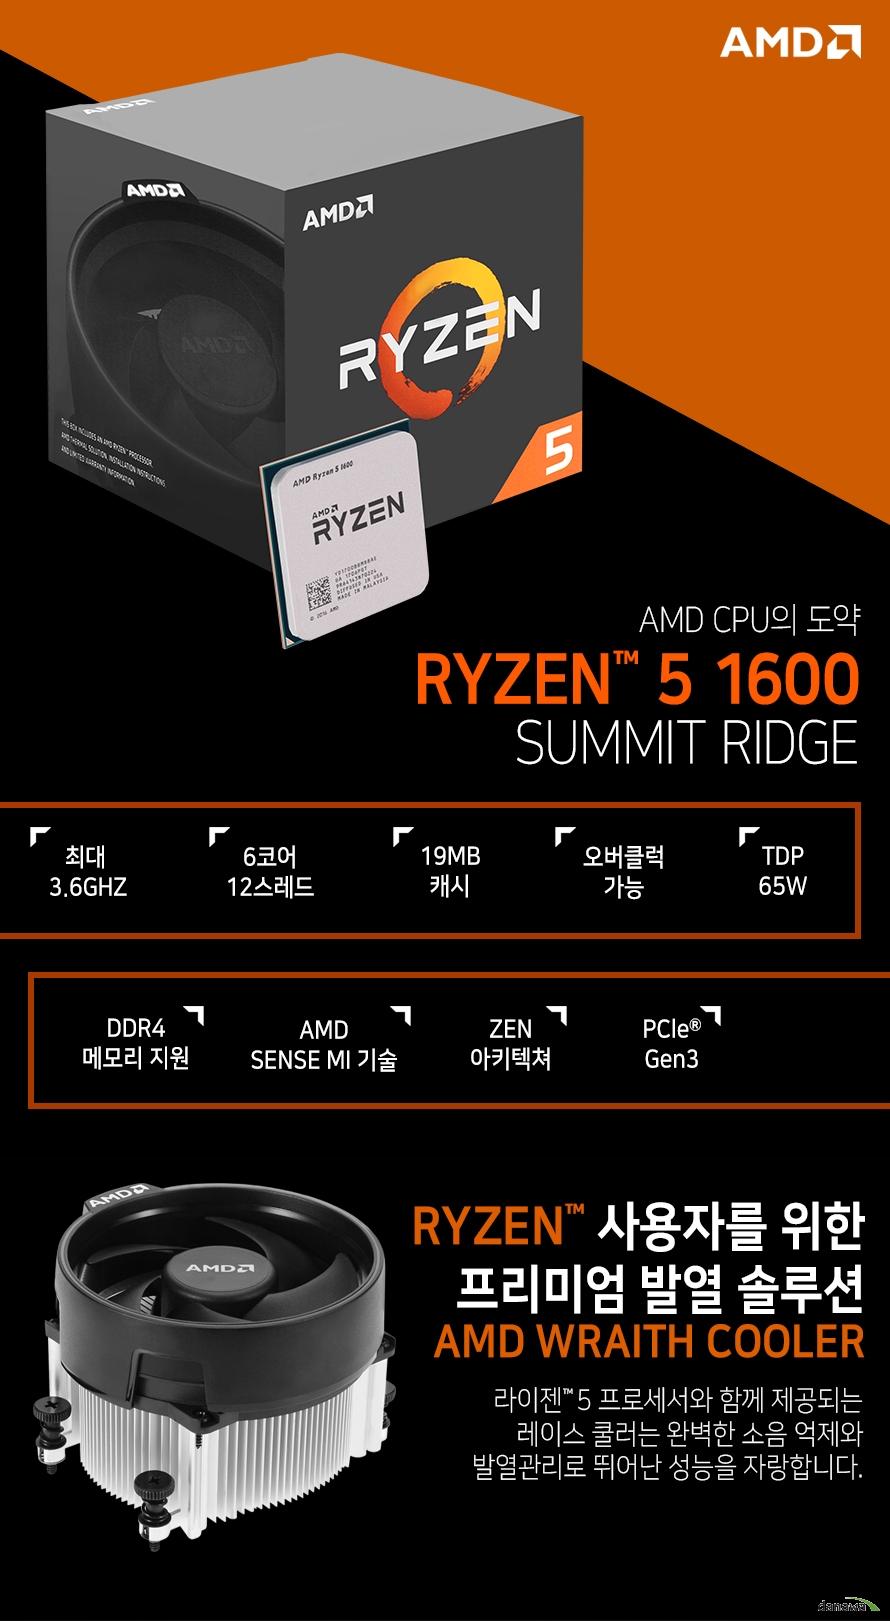 AMD CPU의 도약         RYZEN 5 1600         SUMMIT RIDGE                  최대 3.6GHZ          6코어 12스레드         19MB 캐시         오버클럭 가능         TDP 65W         DDR4 메모리 지원         AMD SENSE MI 기술         ZEN 아키텍쳐         PCle Gen 3                  RYZEN 사용자를 위한 프리미엄 발열 솔루션         AMD WRAITH COOLER                  라이젠 5 프로세서와 함께 제공되는 레이스 쿨러는          완벽한 소음 억제와 발열관리로 뛰어난 성능을 자랑합니다.